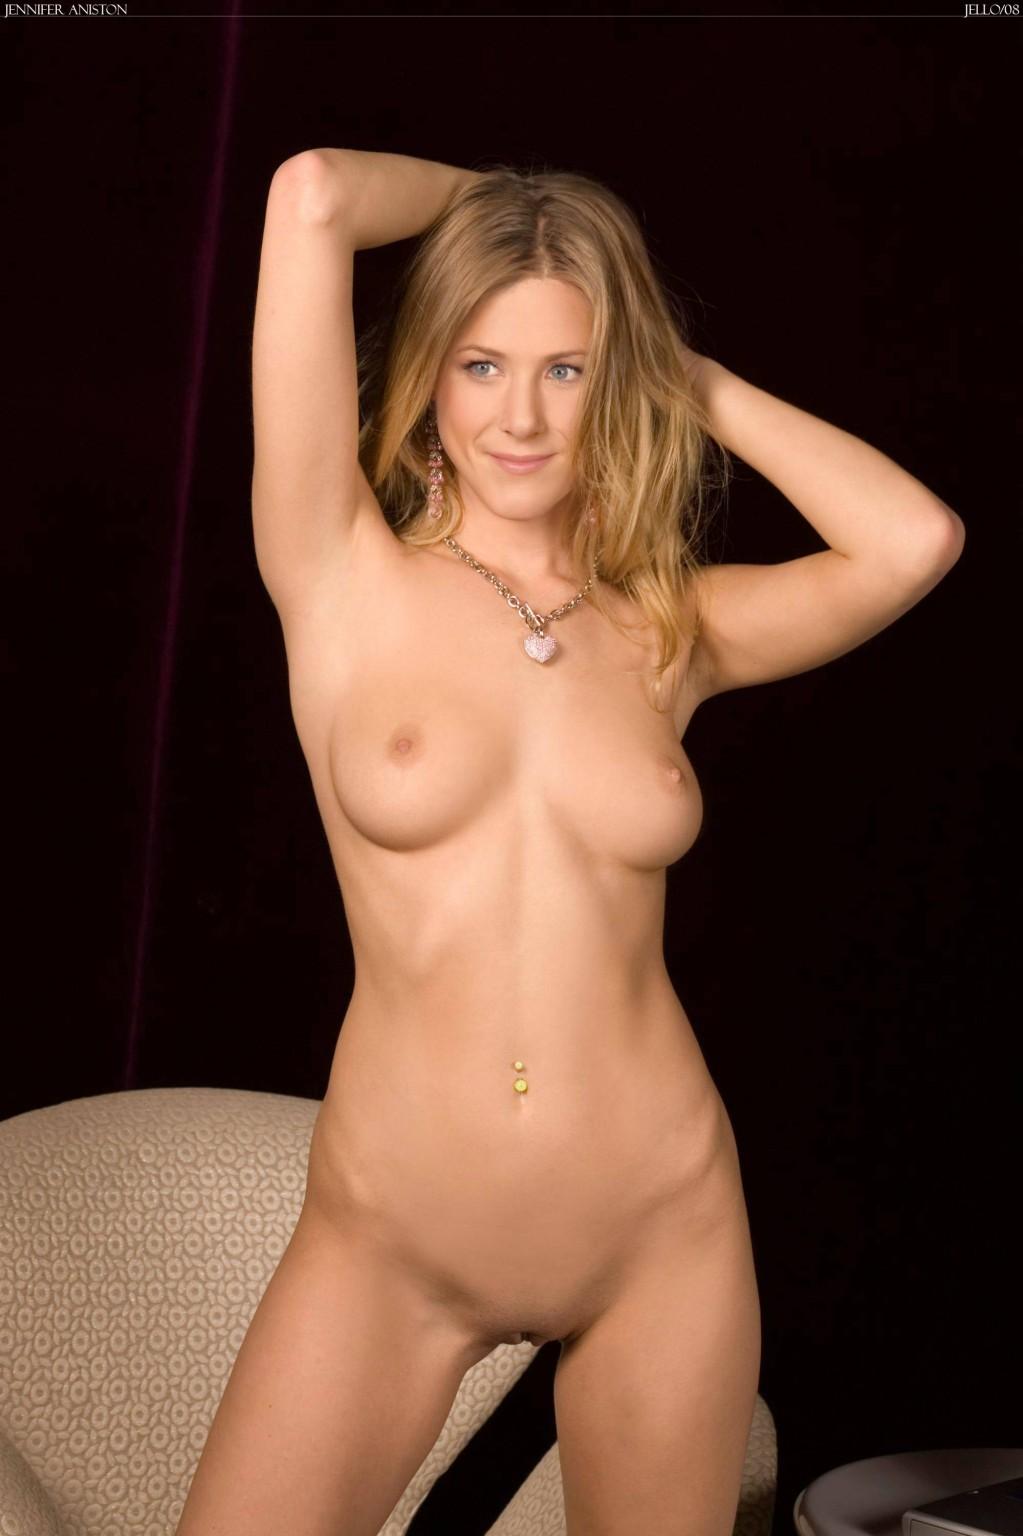 Nude hot ginger girl